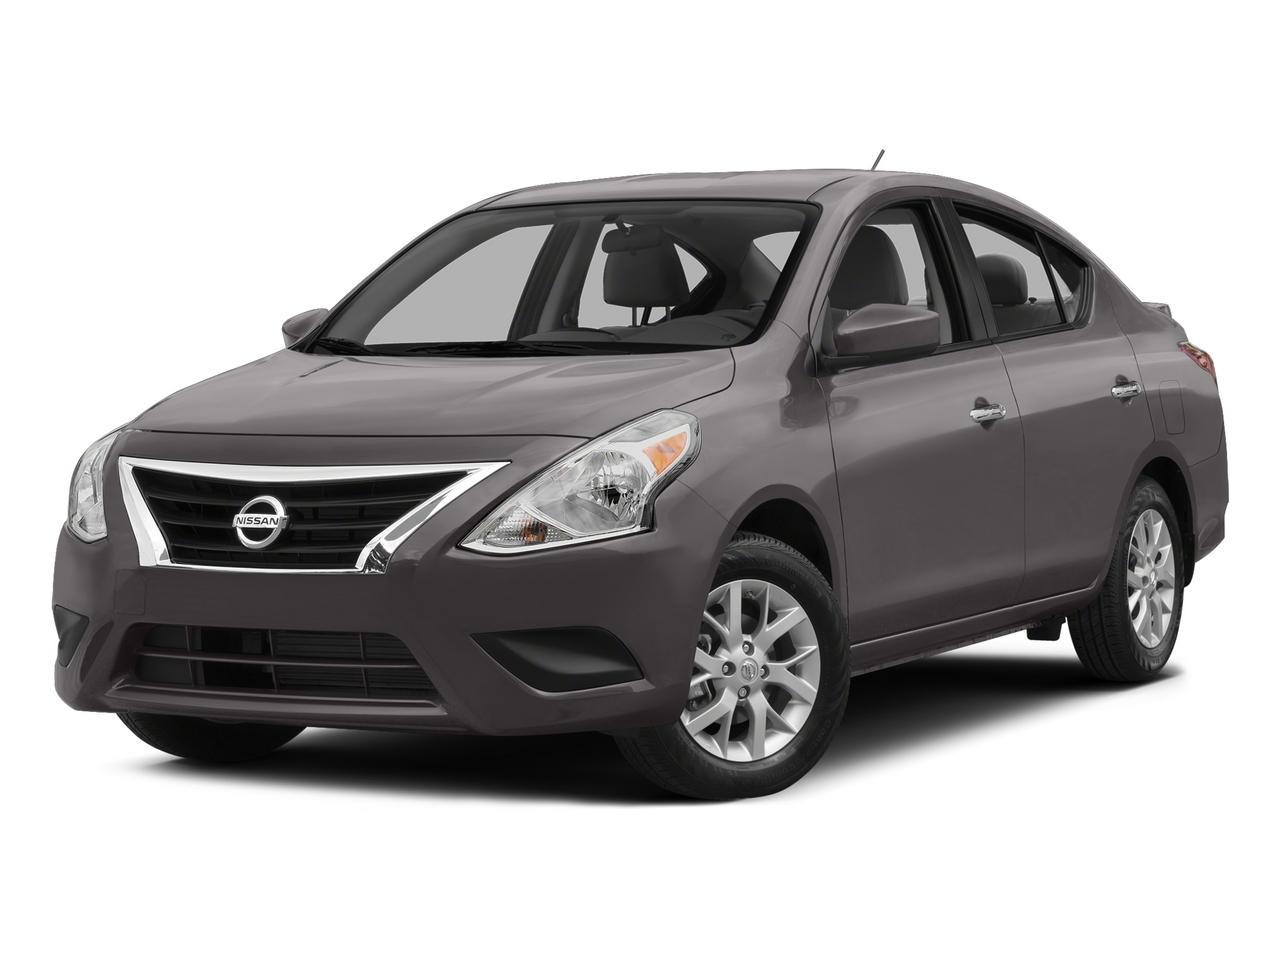 2015 Nissan Versa Vehicle Photo in Beaufort, SC 29906